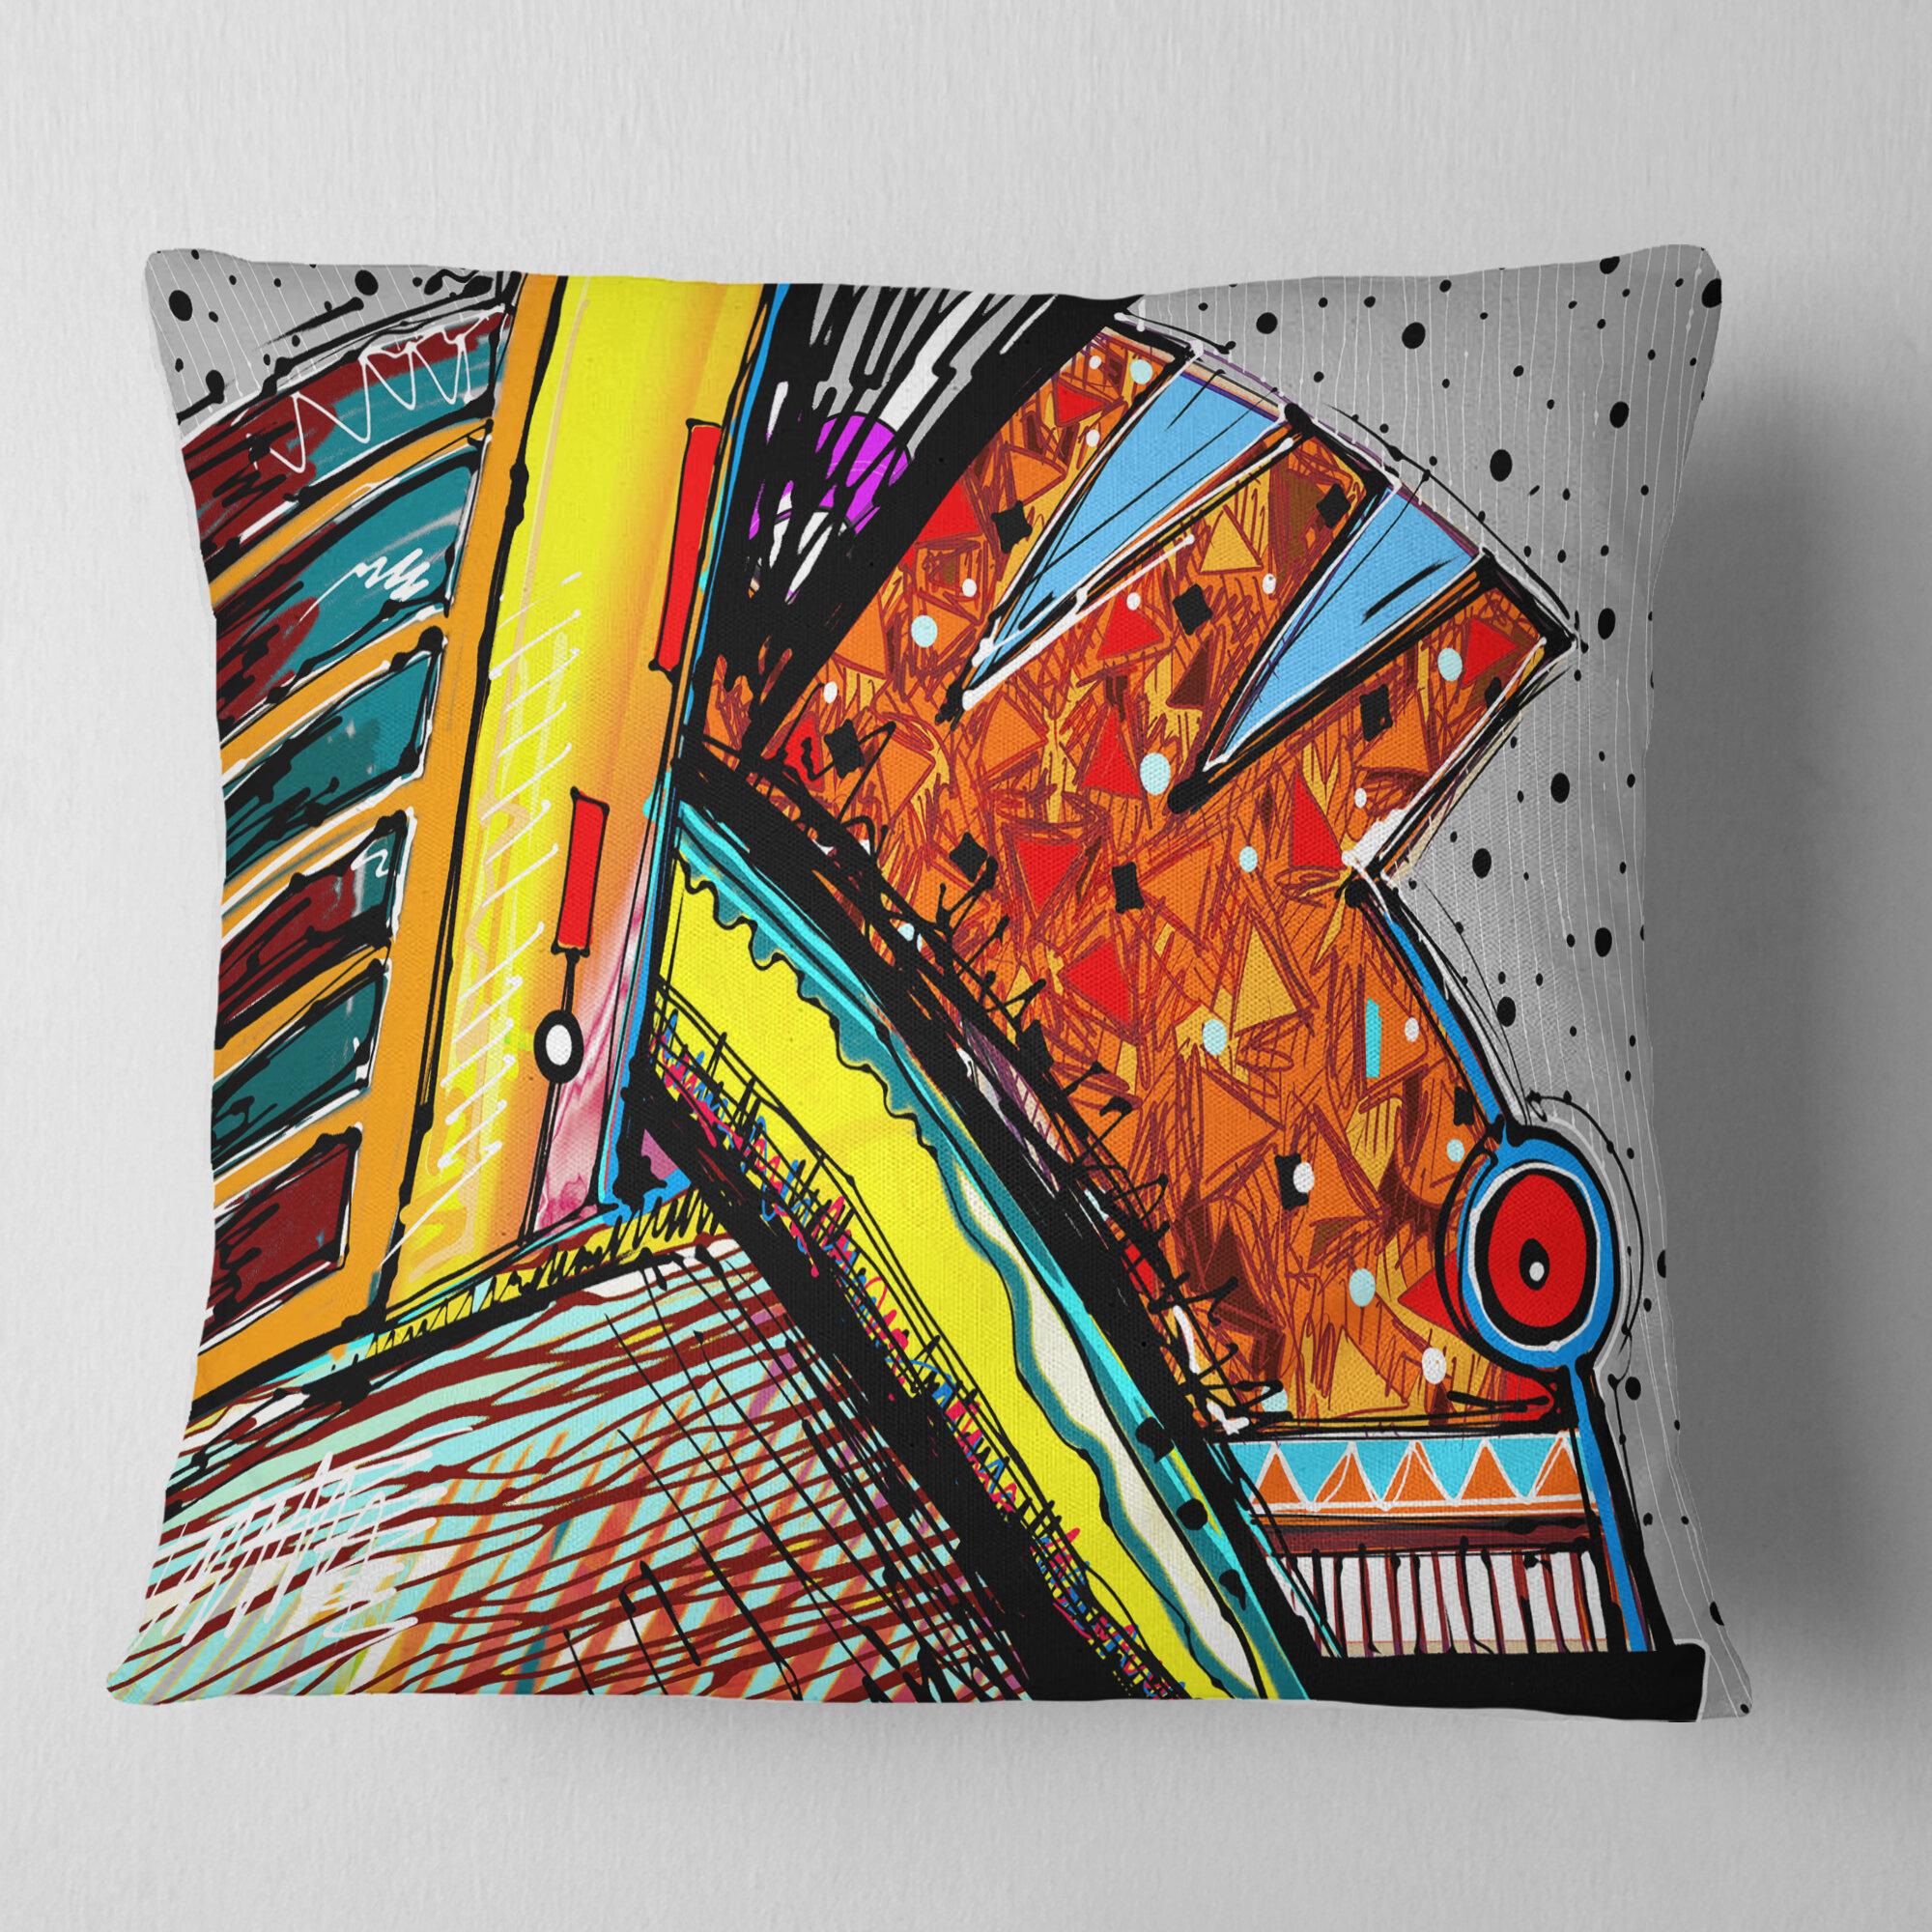 East Urban Home Colorful Abstract Illustration Throw Pillow Wayfair